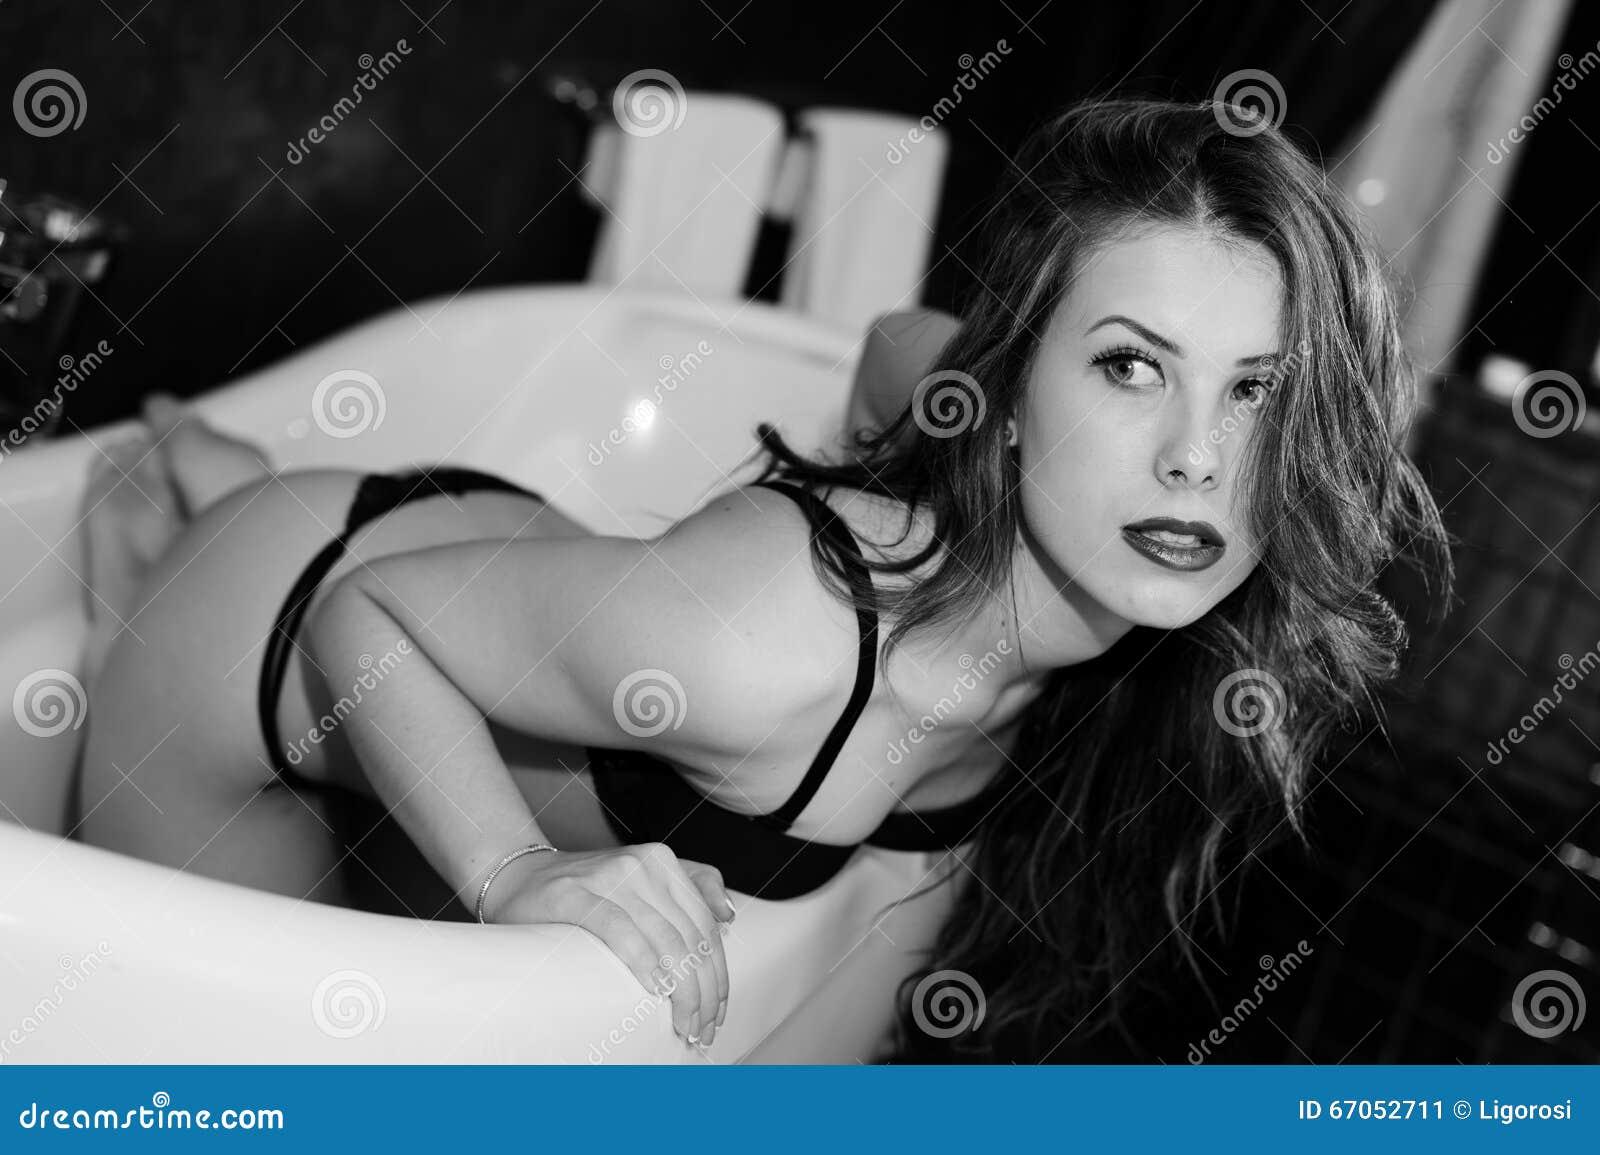 Grote zwarte buit pics